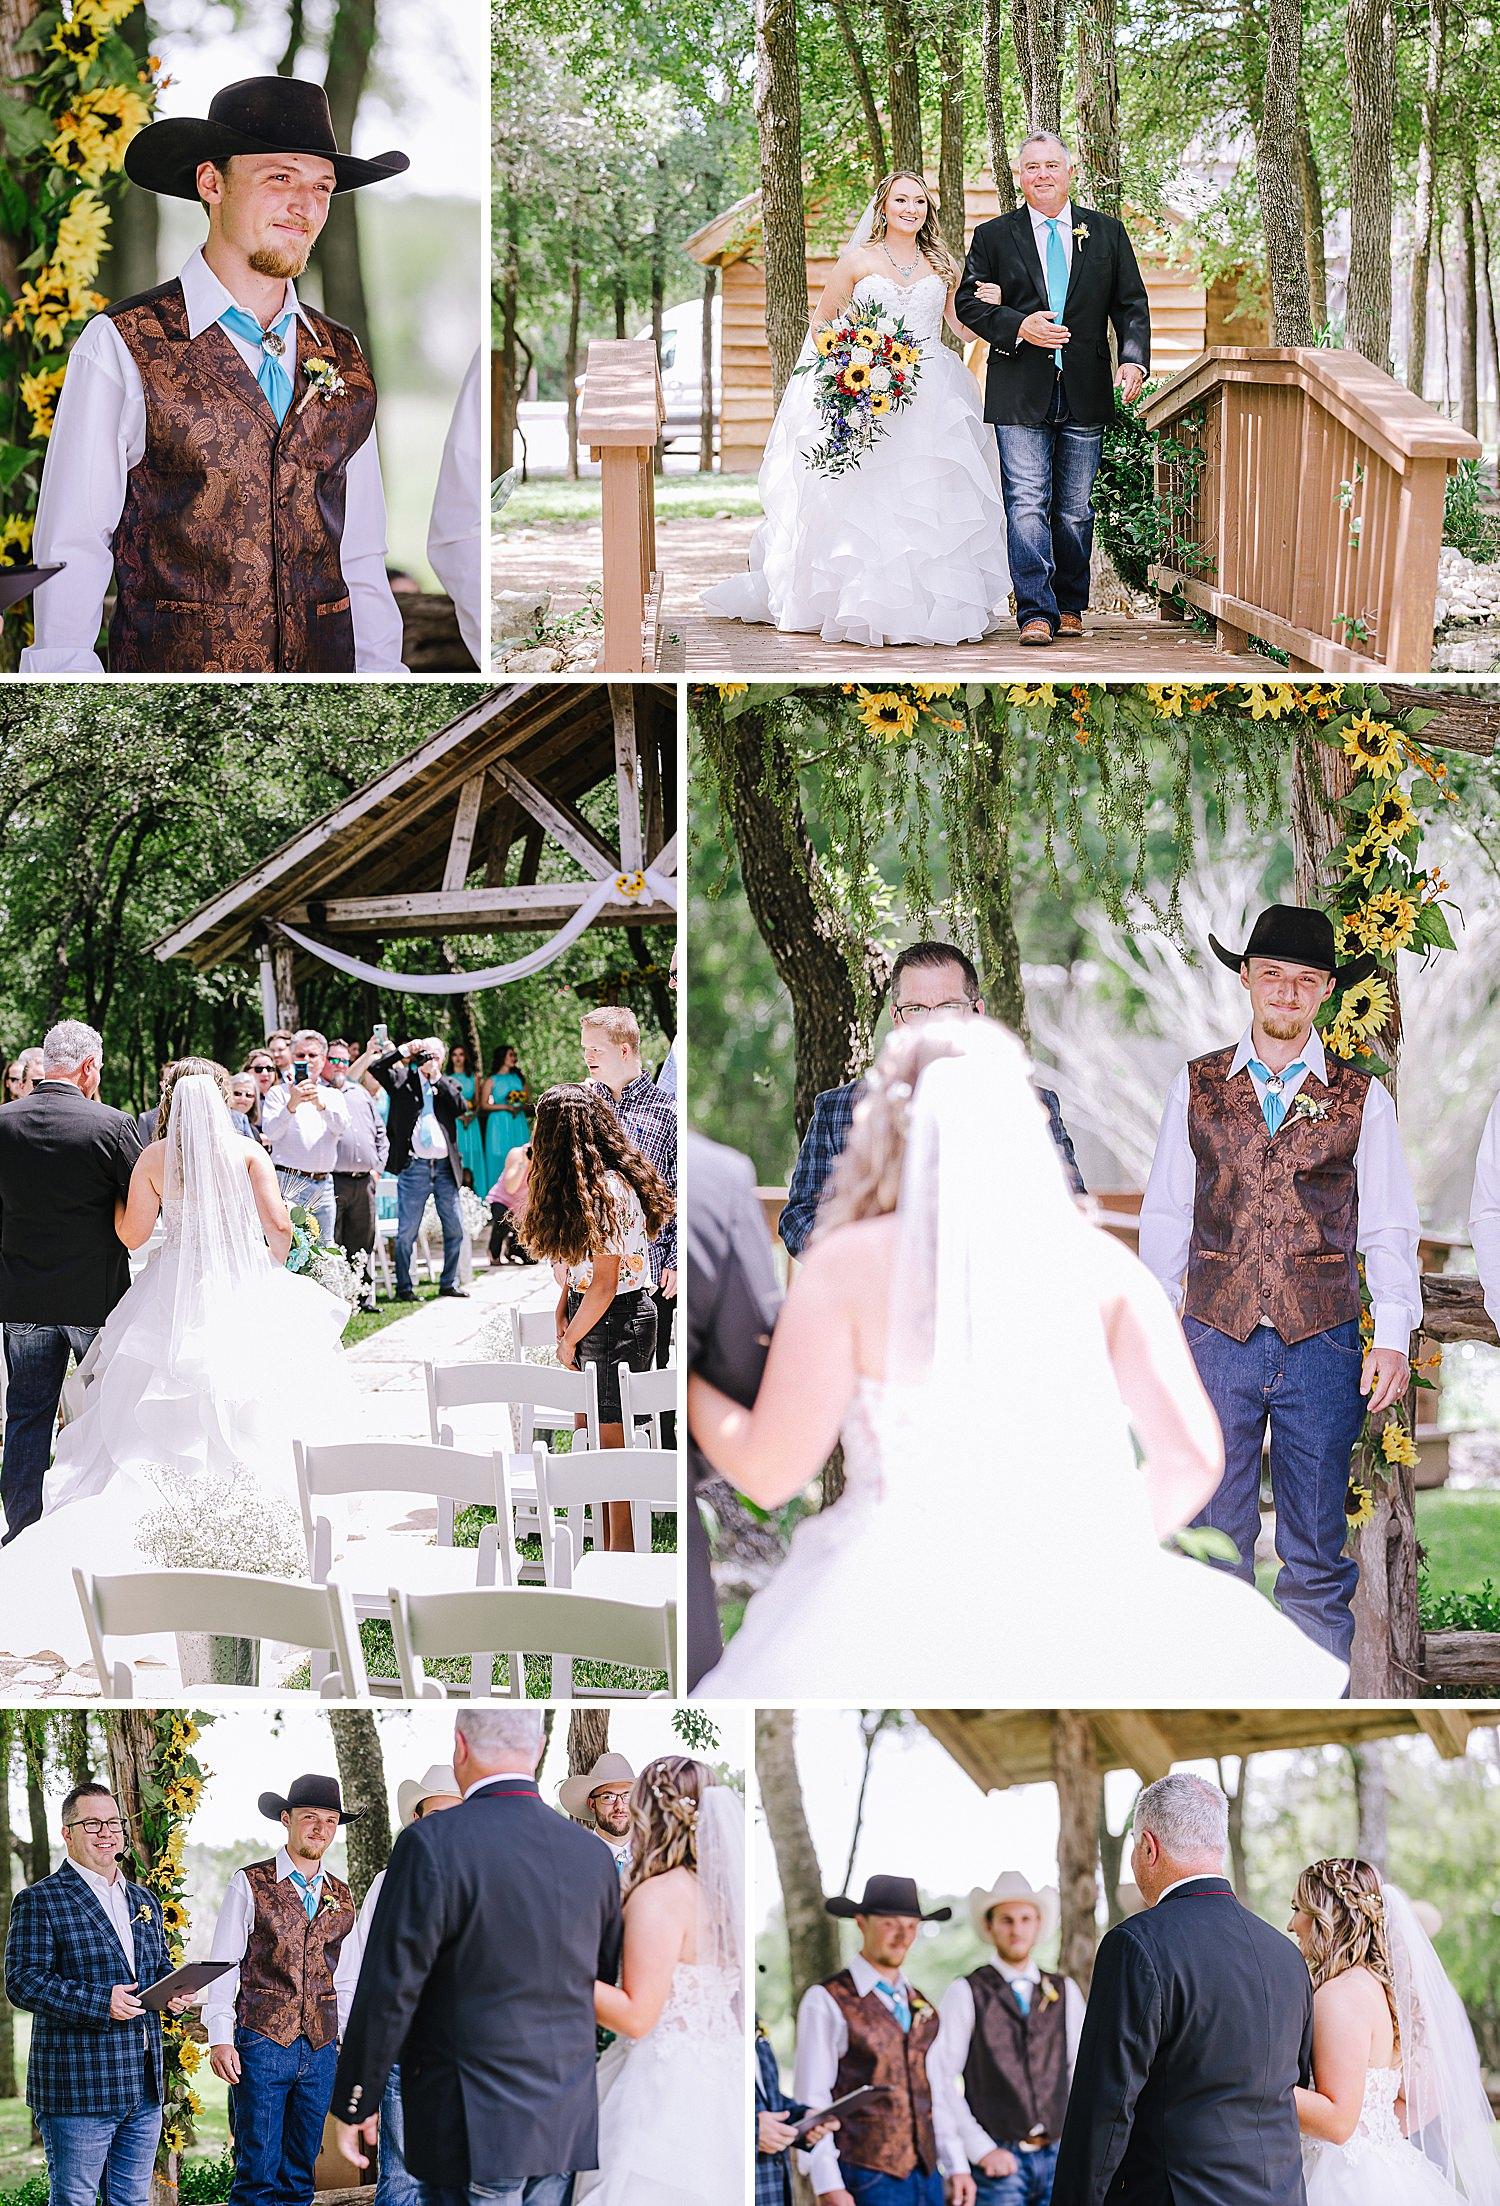 Carly-Barton-Photography-Old-Town-Texas-Rustic-Wedding-Photos-Sunflowers-Boots-Kyle-Texas_0036.jpg